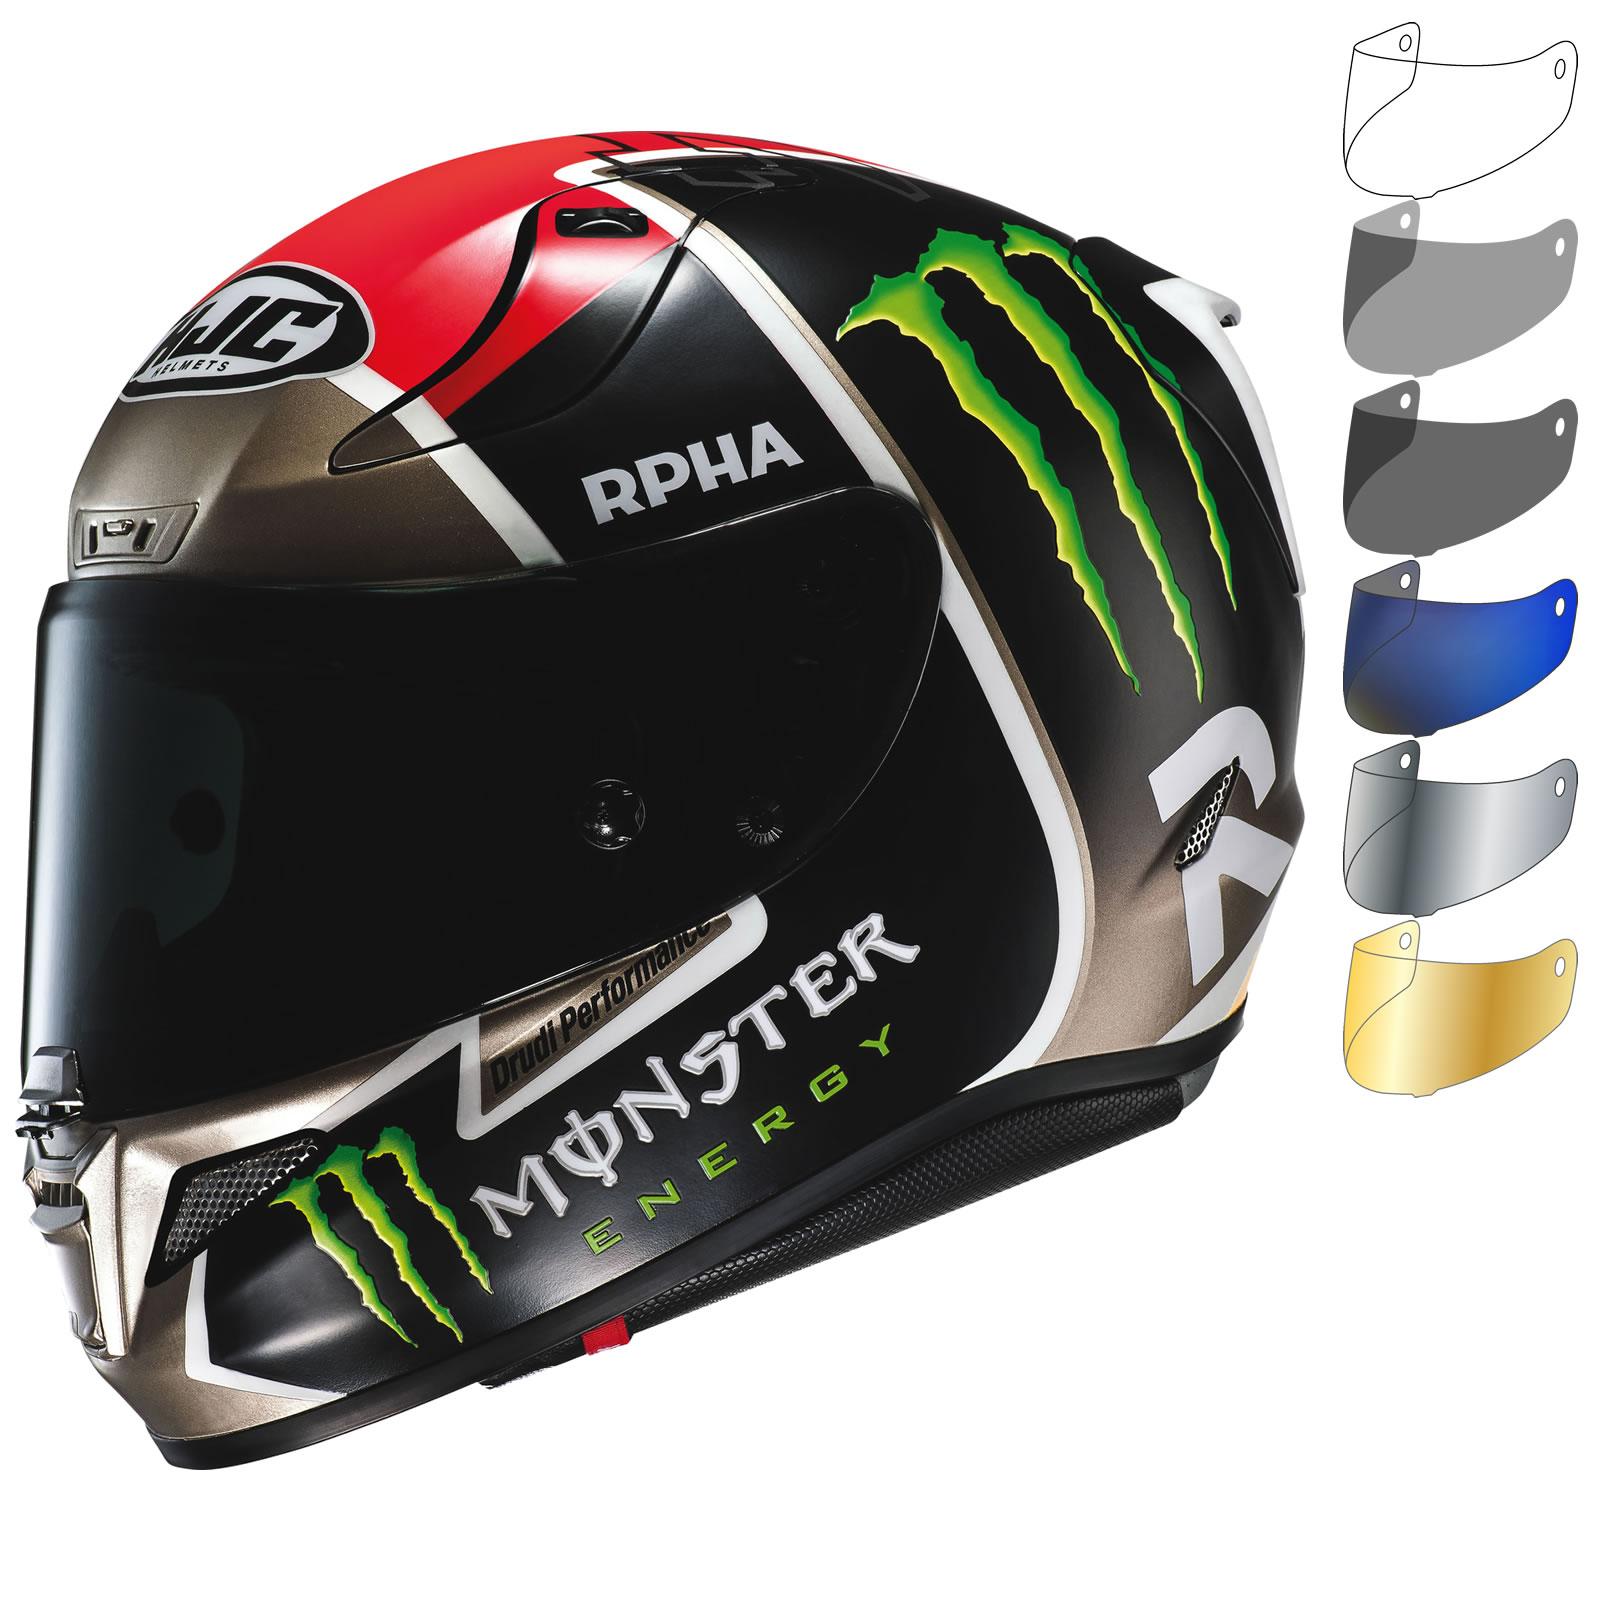 hjc rpha 11 monster jonas folger replica motorcycle helmet. Black Bedroom Furniture Sets. Home Design Ideas